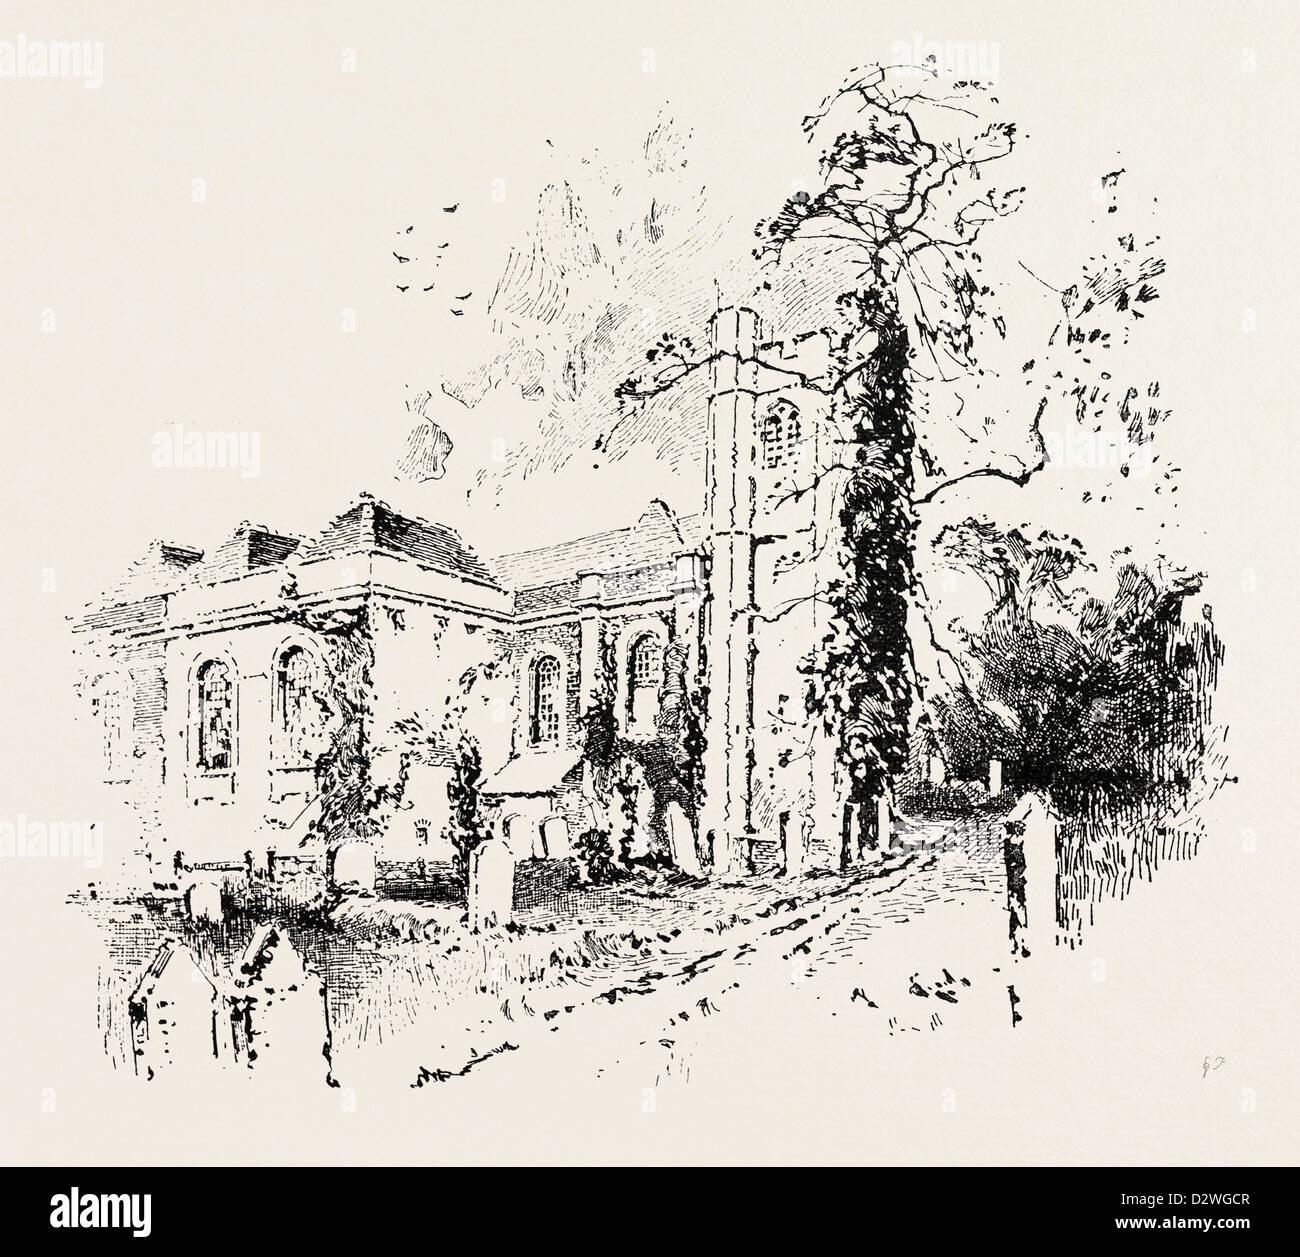 HANDEL'S CHURCH NEAR EDGWARE - Stock Image